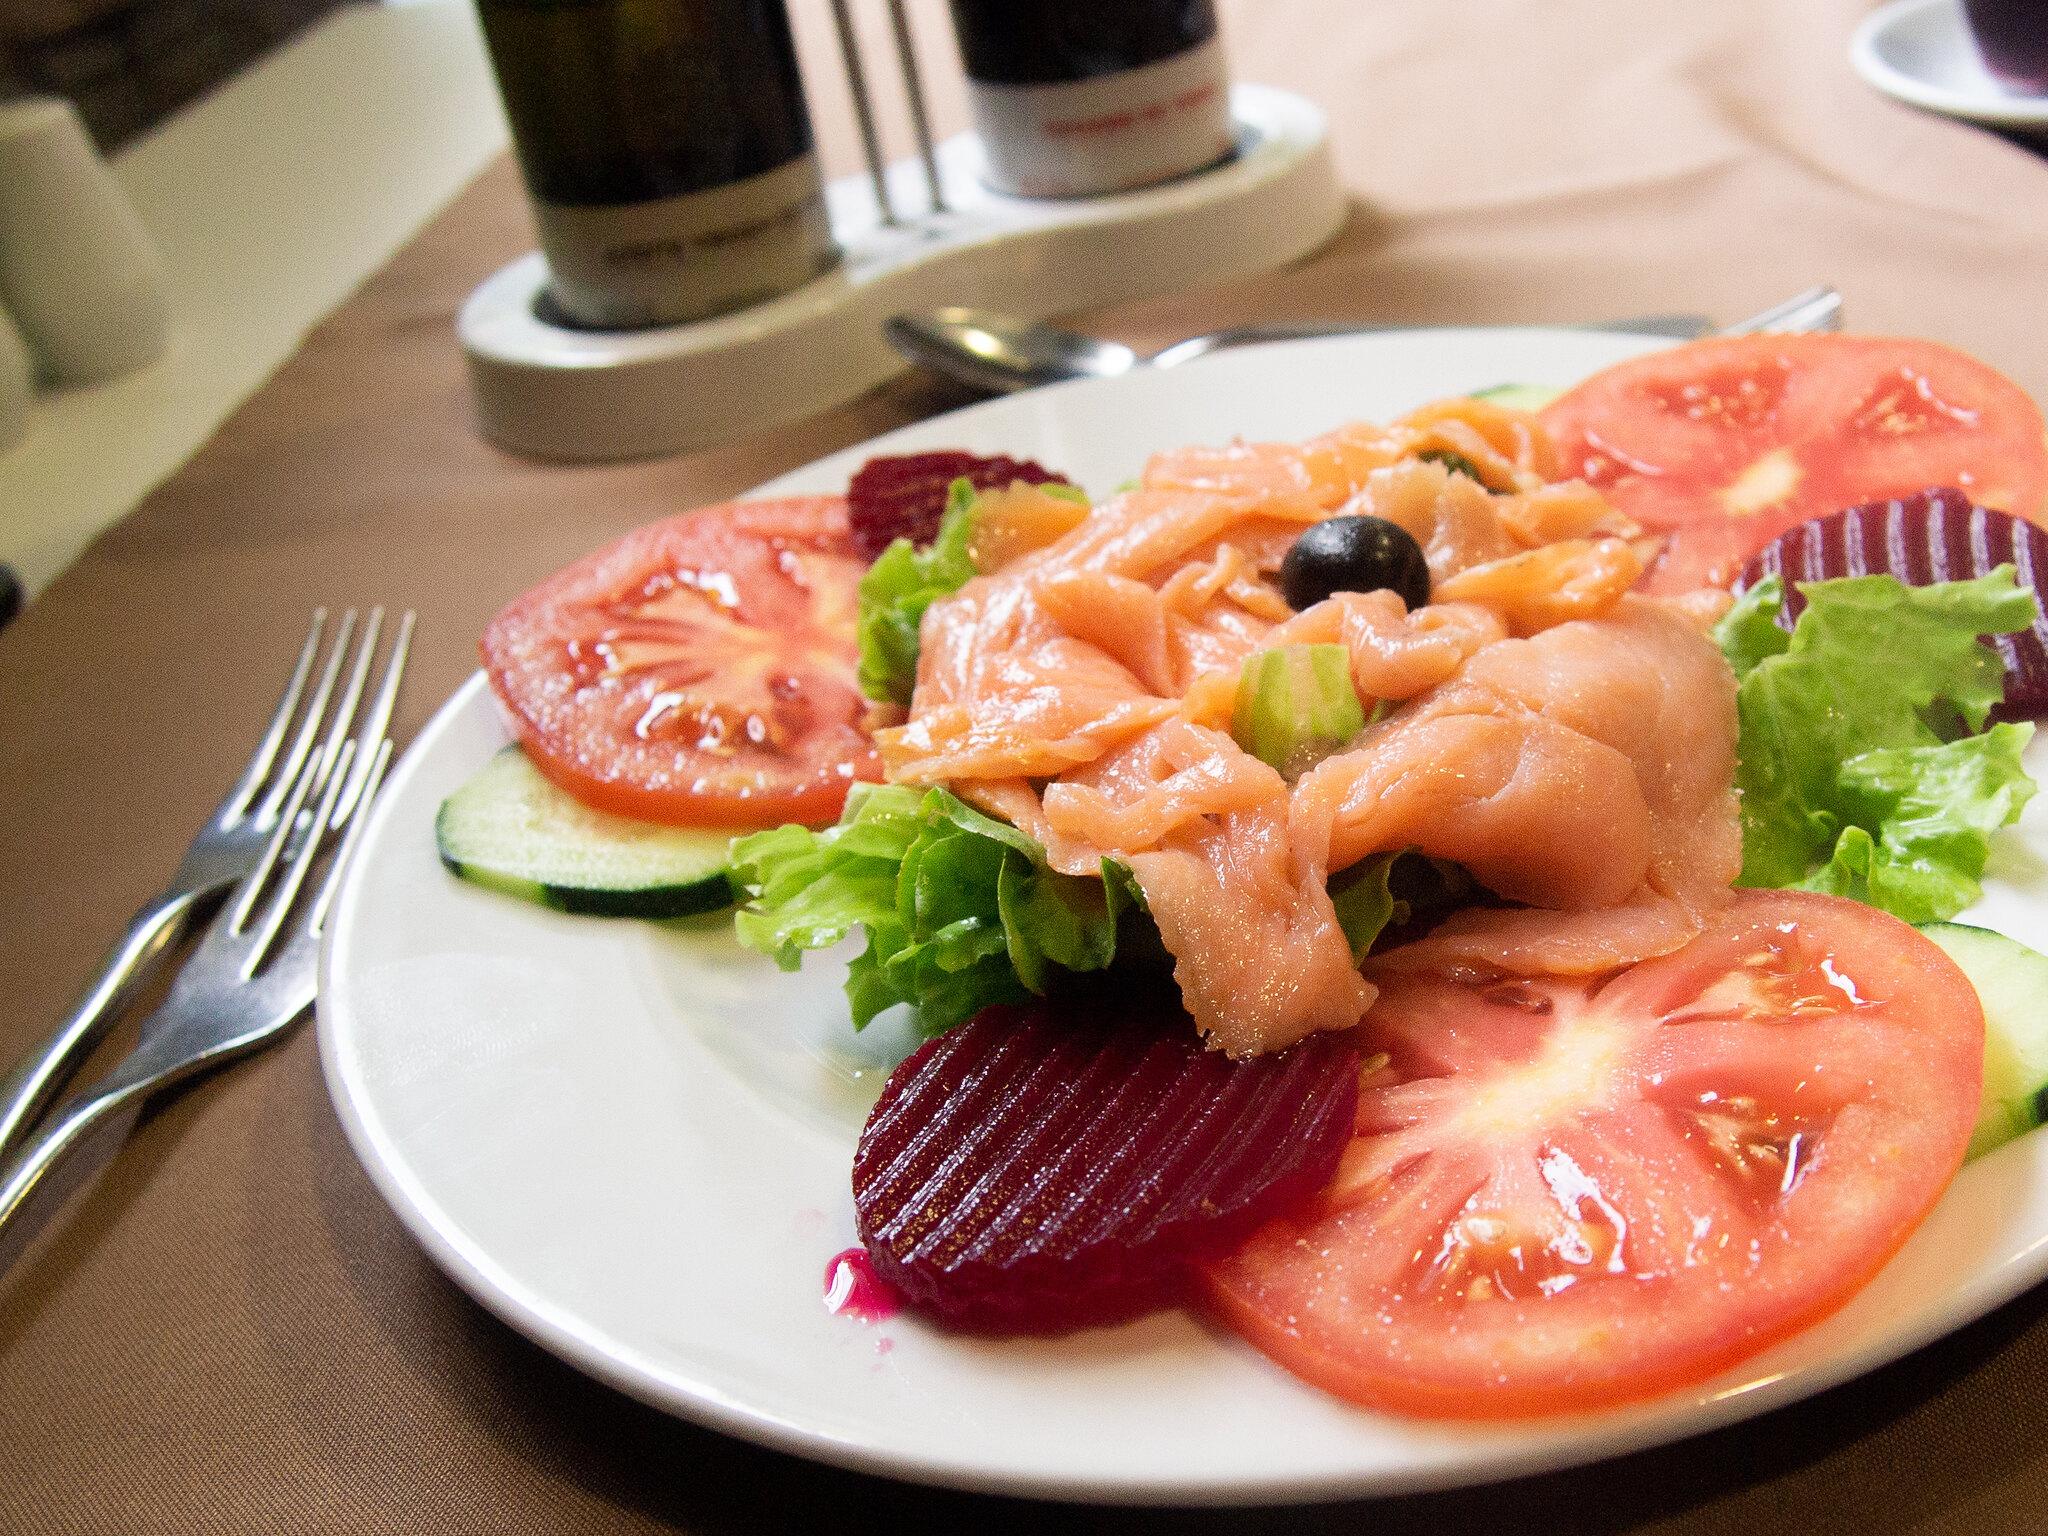 Madeira_restaurant_annukka_vuorela8